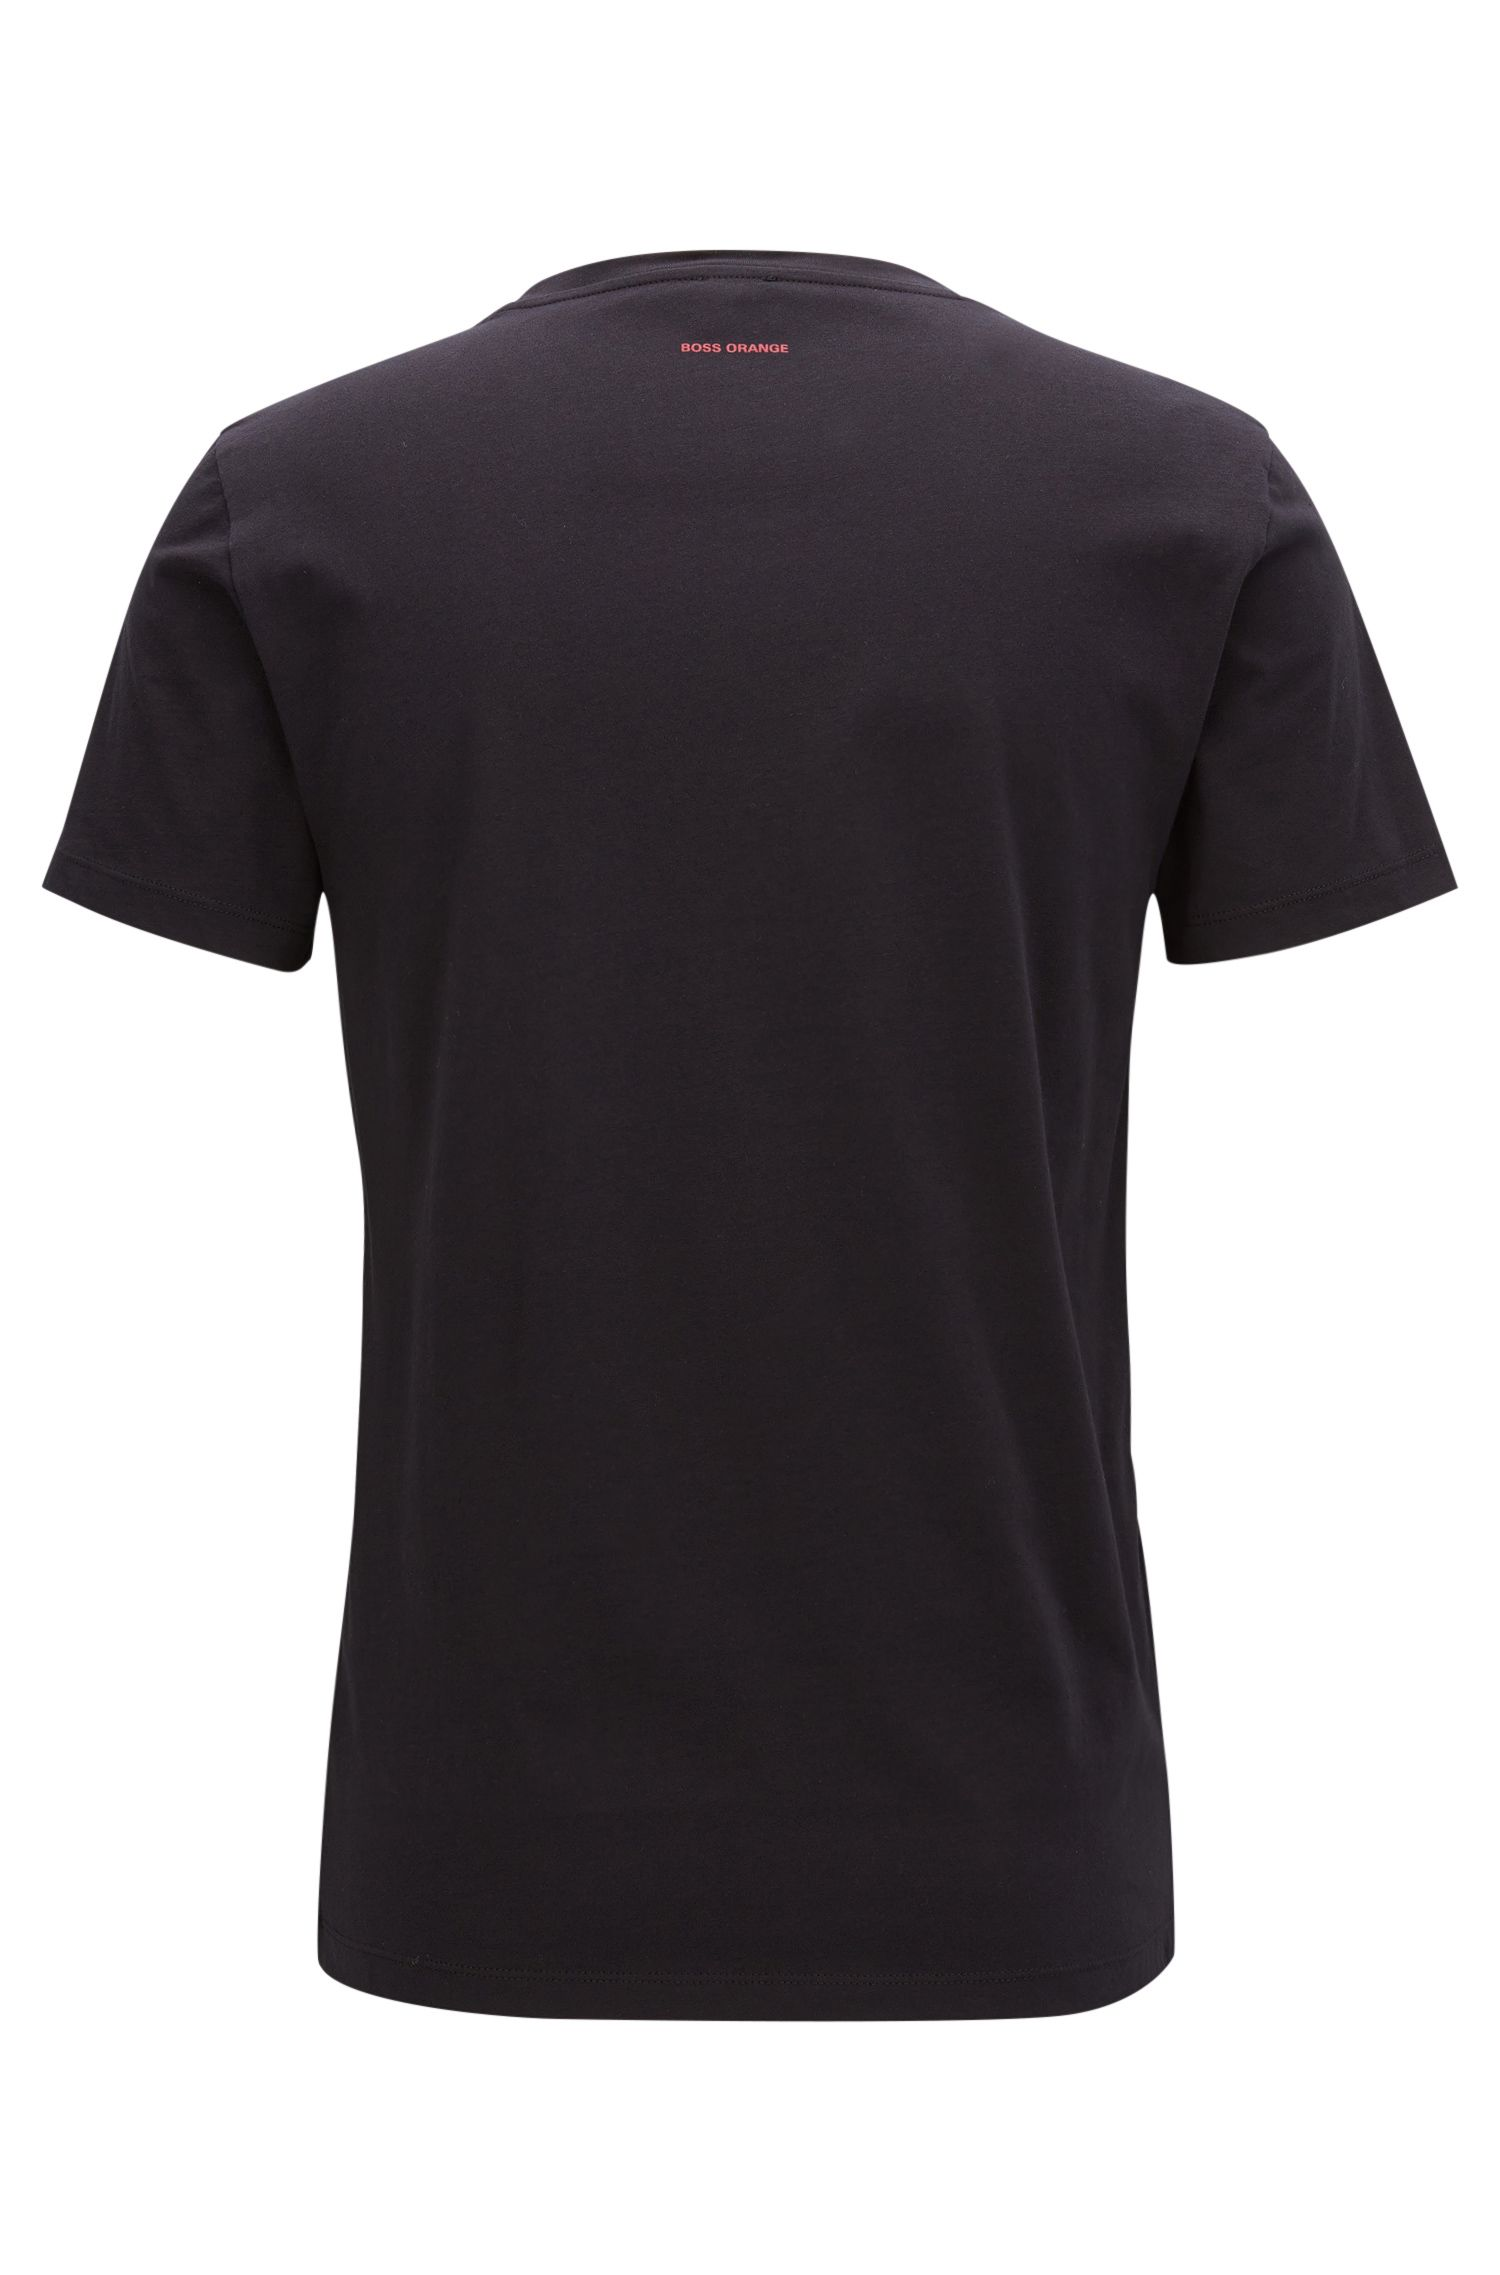 Cotton Graphic T-Shirt | Typical, Black